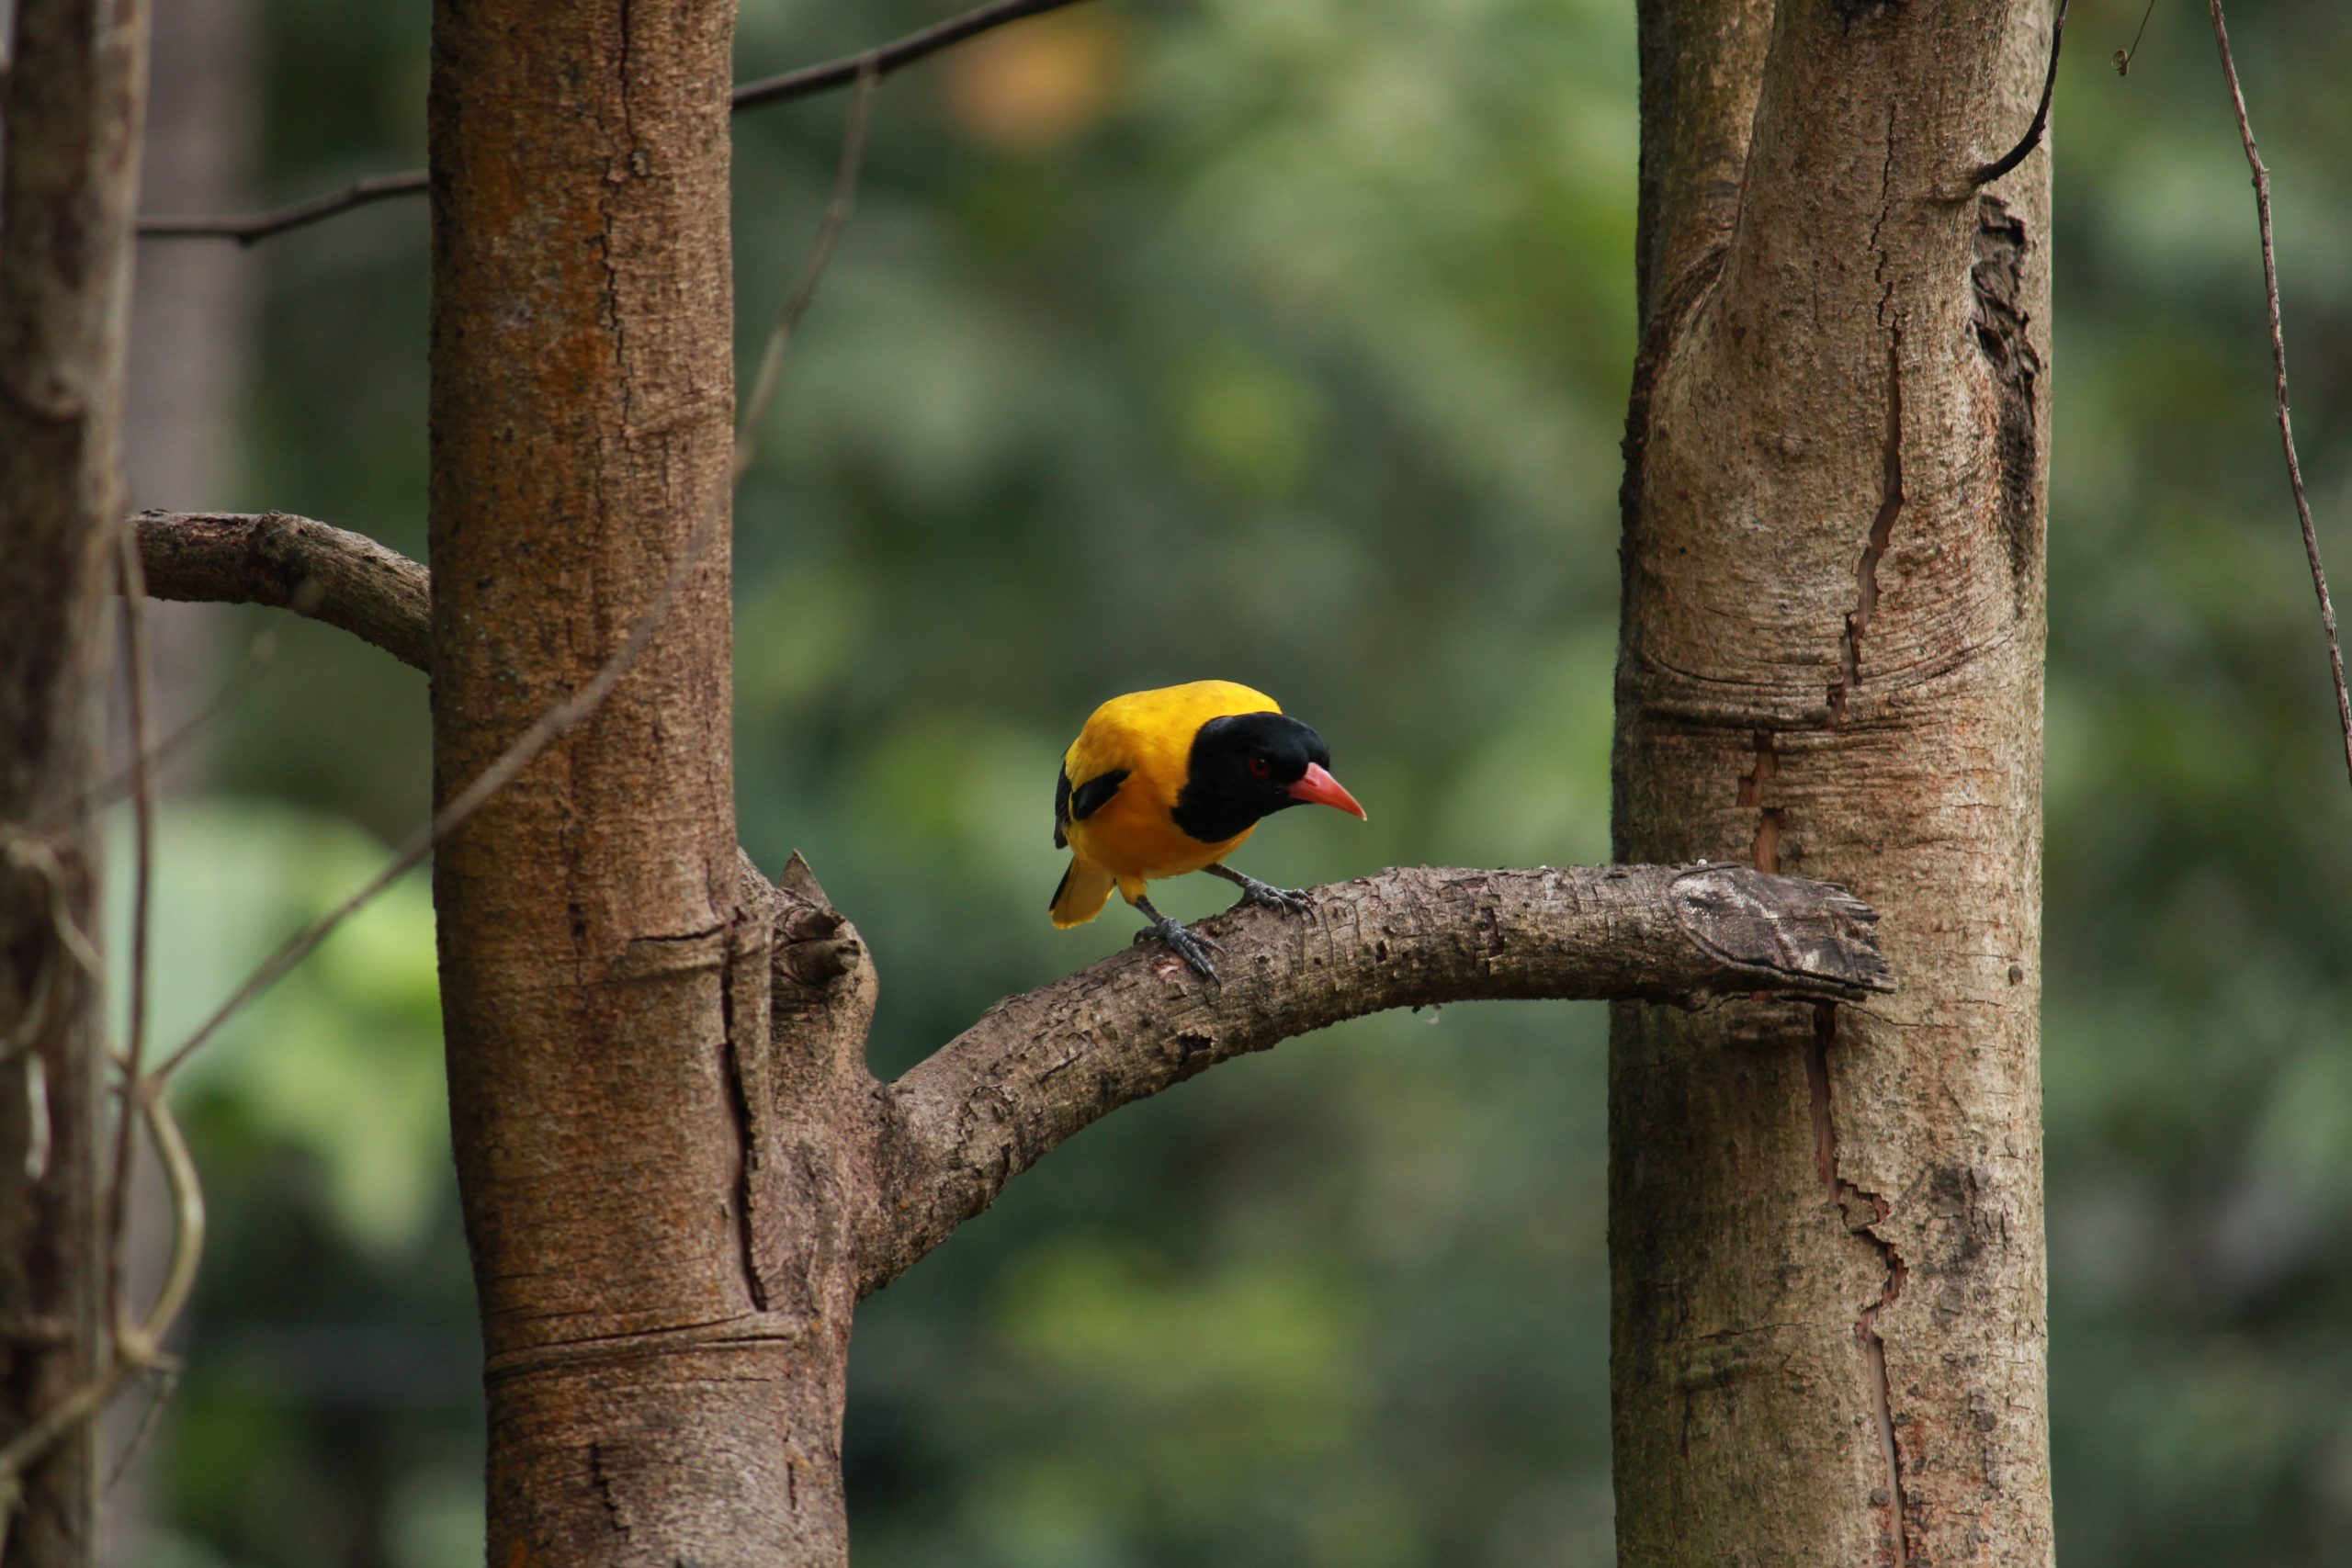 Perching Yellow Bird